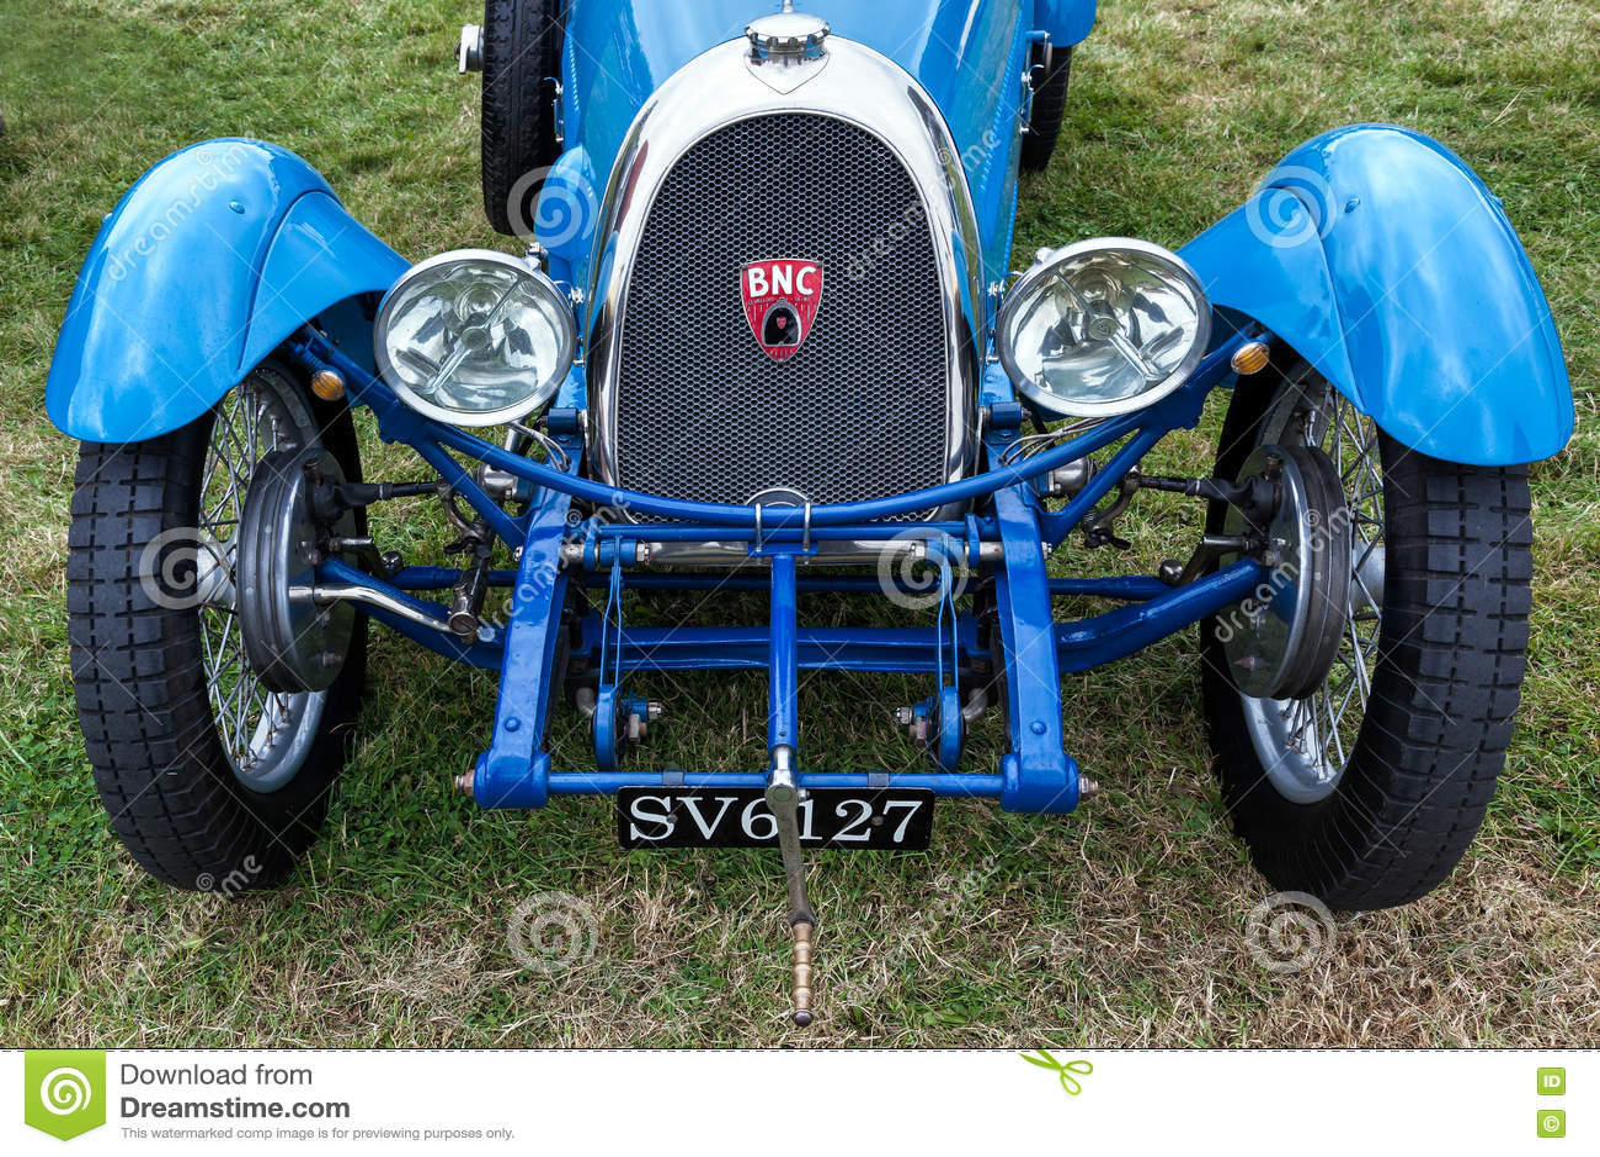 GOODWOOD, WEST SUSSEX/UK - SEPTEMBER 14 : Bollack Netter and Cie Roadster parked in car park at Goodwood on SEPTEMBER 14, 2012